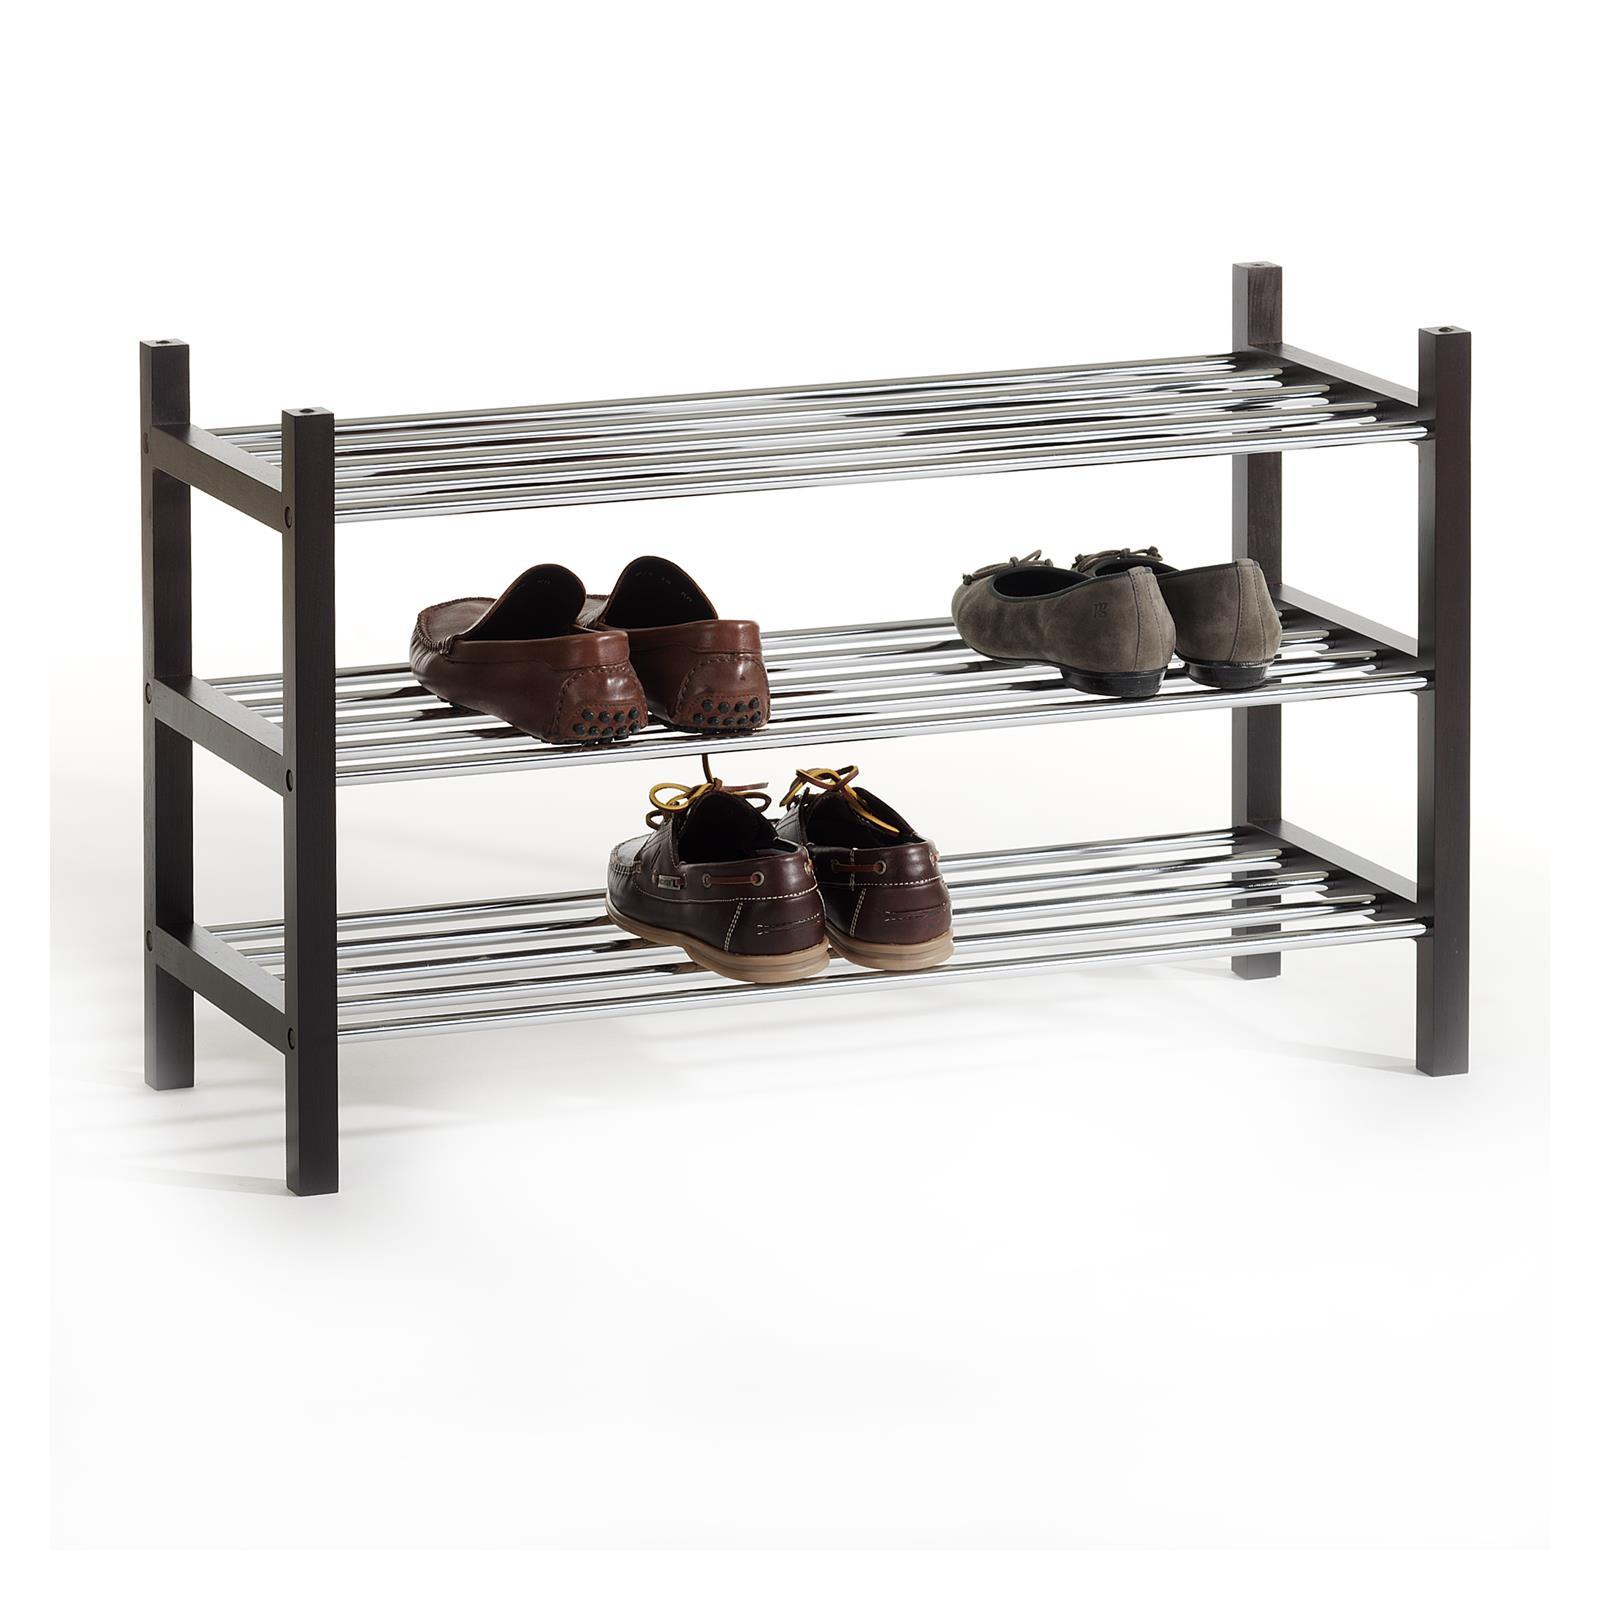 schuhregal schuhablage schuhst nder schuhschrank holz 3. Black Bedroom Furniture Sets. Home Design Ideas